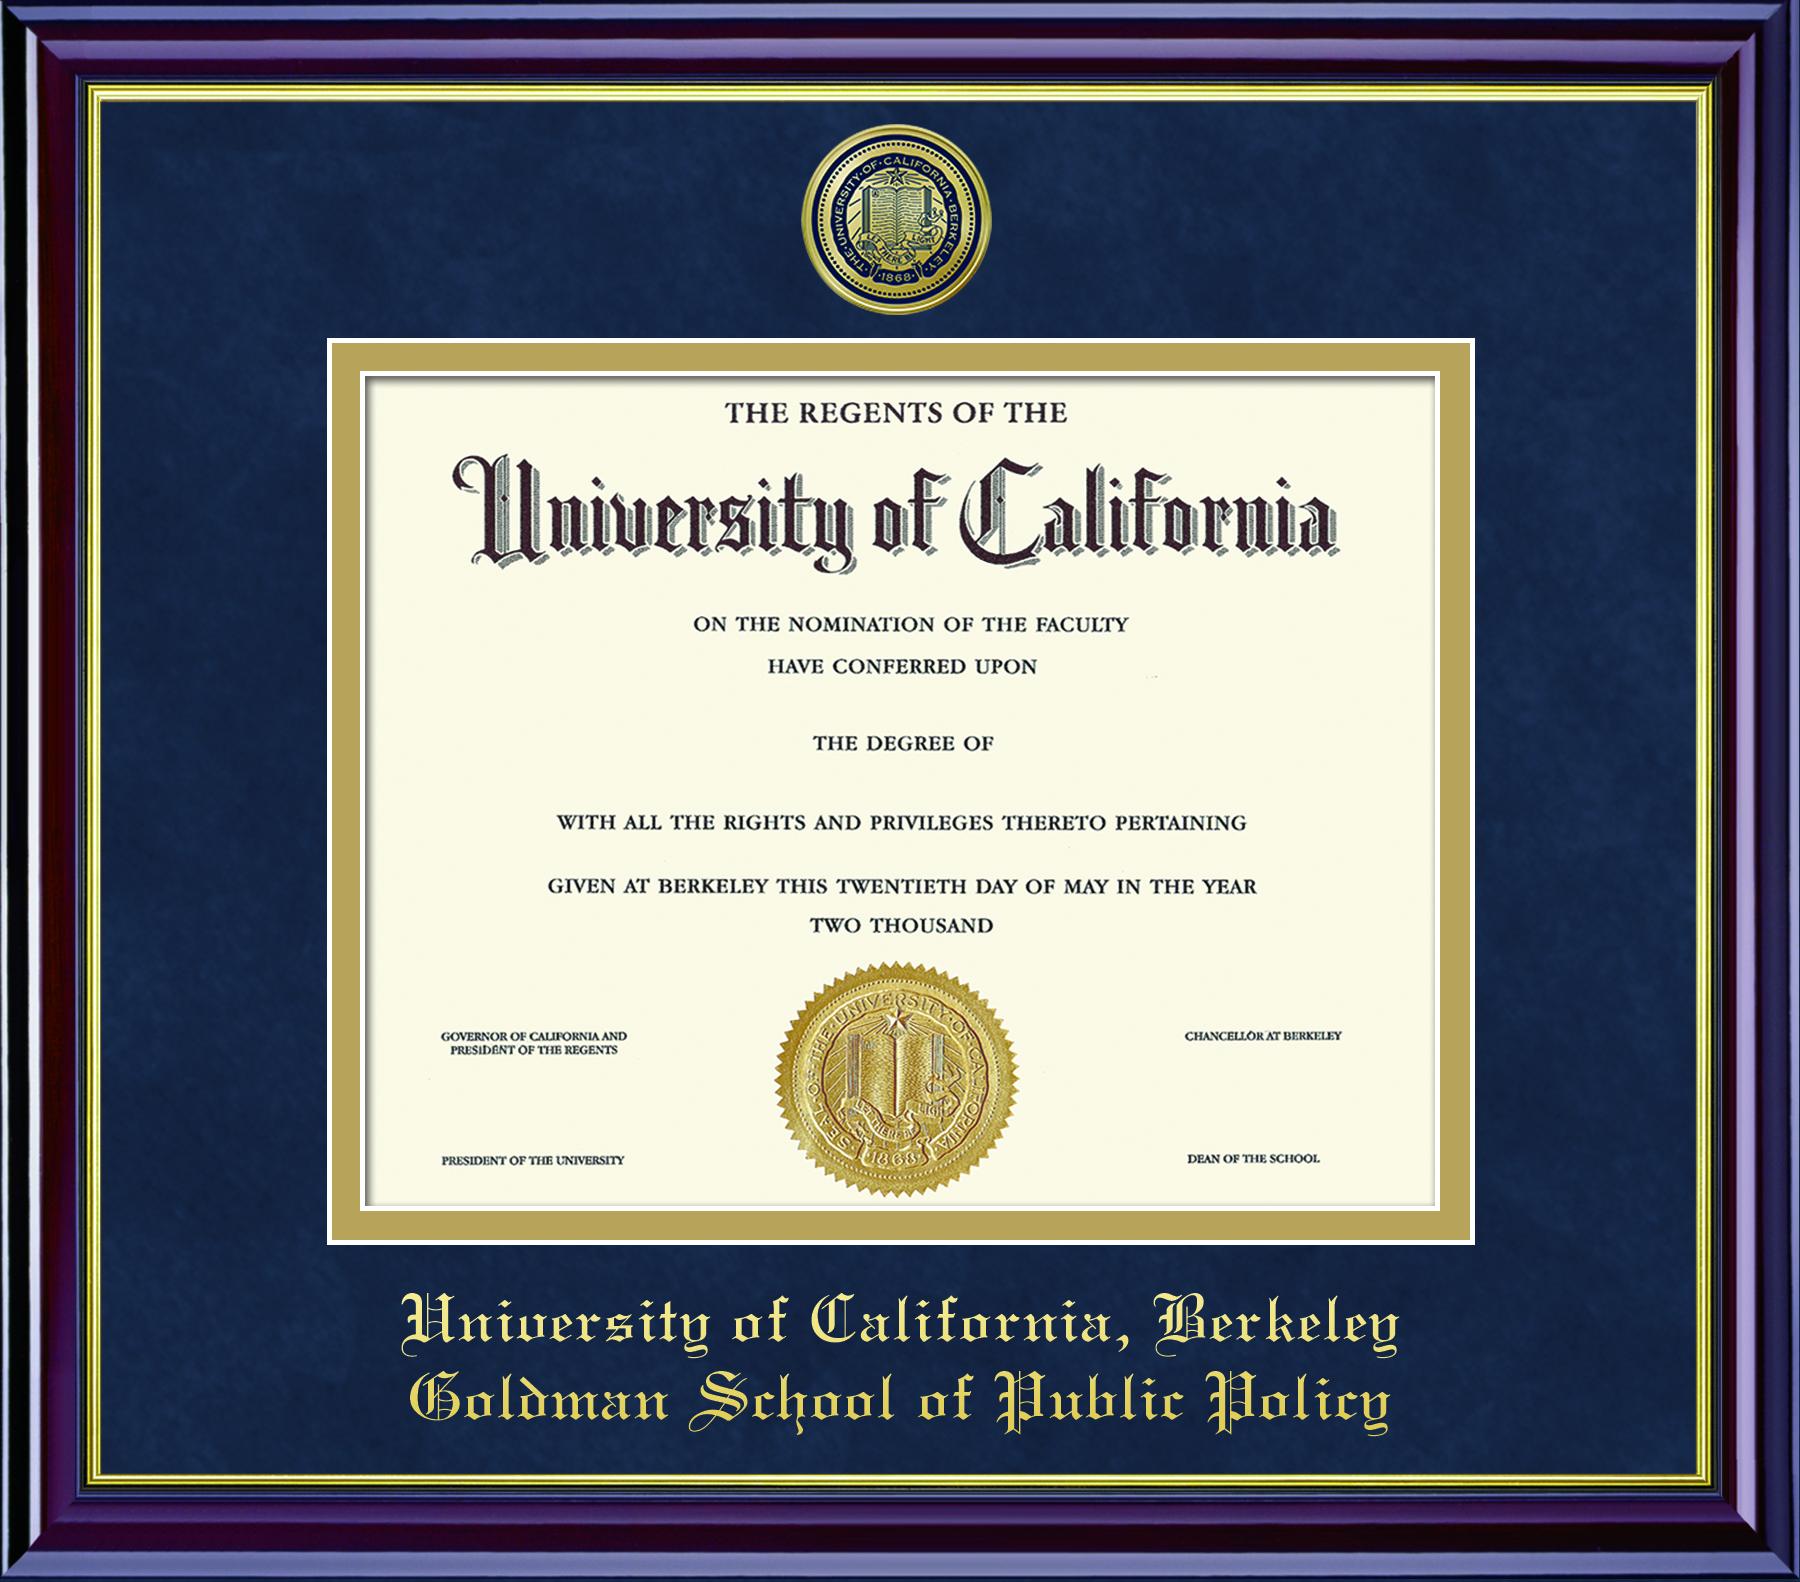 image of: Diploma Frame Mahogany Gold Goldman School of Public Policy